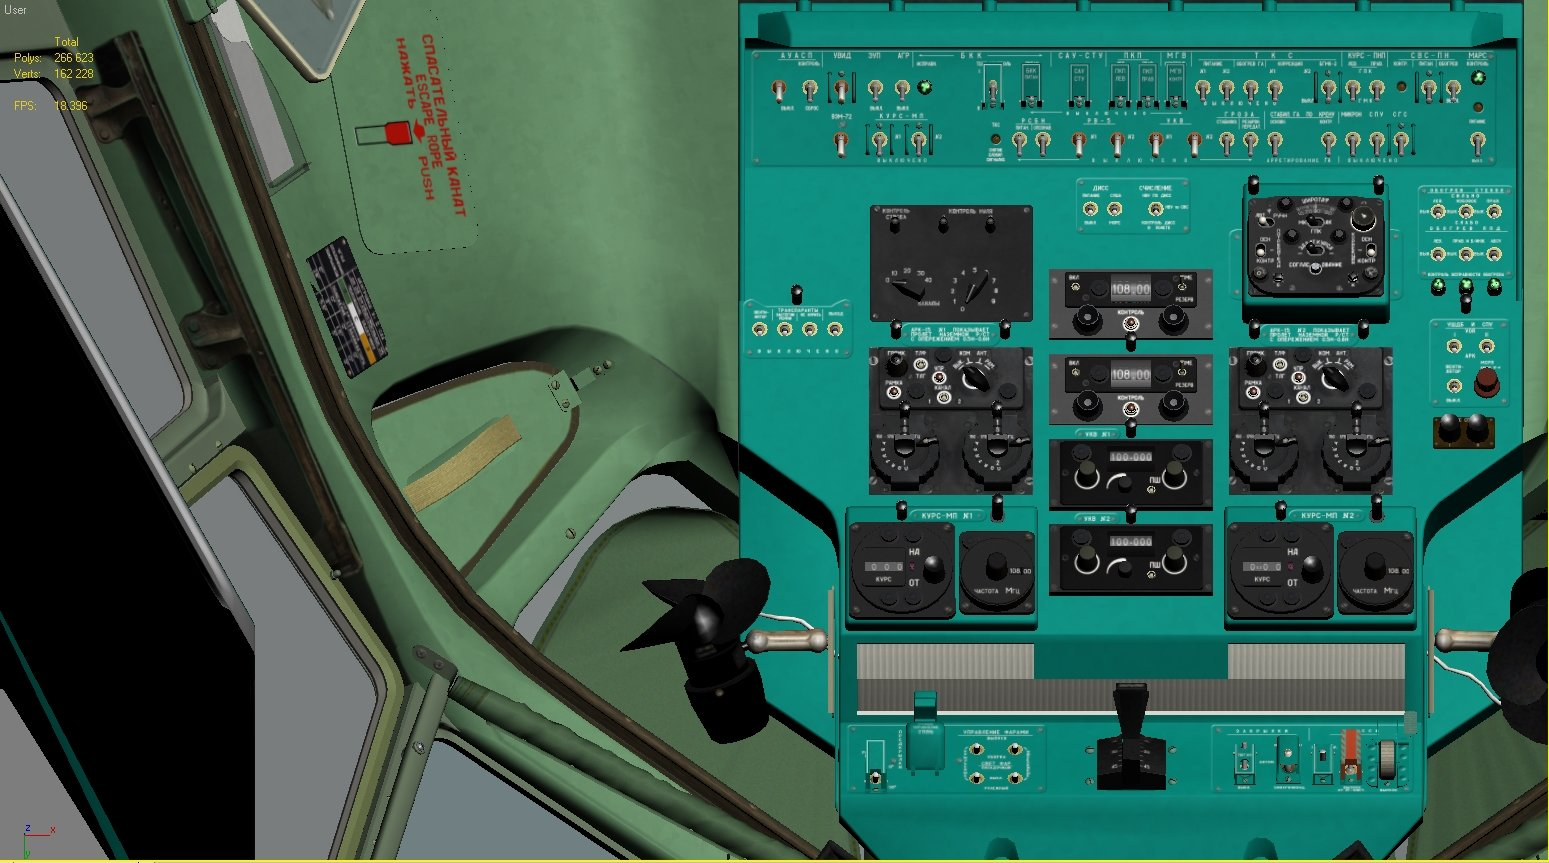 2111410166_2019-04-2001_41_40-Tu-154_B2_VC487.max-ProjectFolder_D__Documents_3dsmax-Autodesk.jpg.1b5660cd7dc18492a5e0f19e53a9273e.jpg